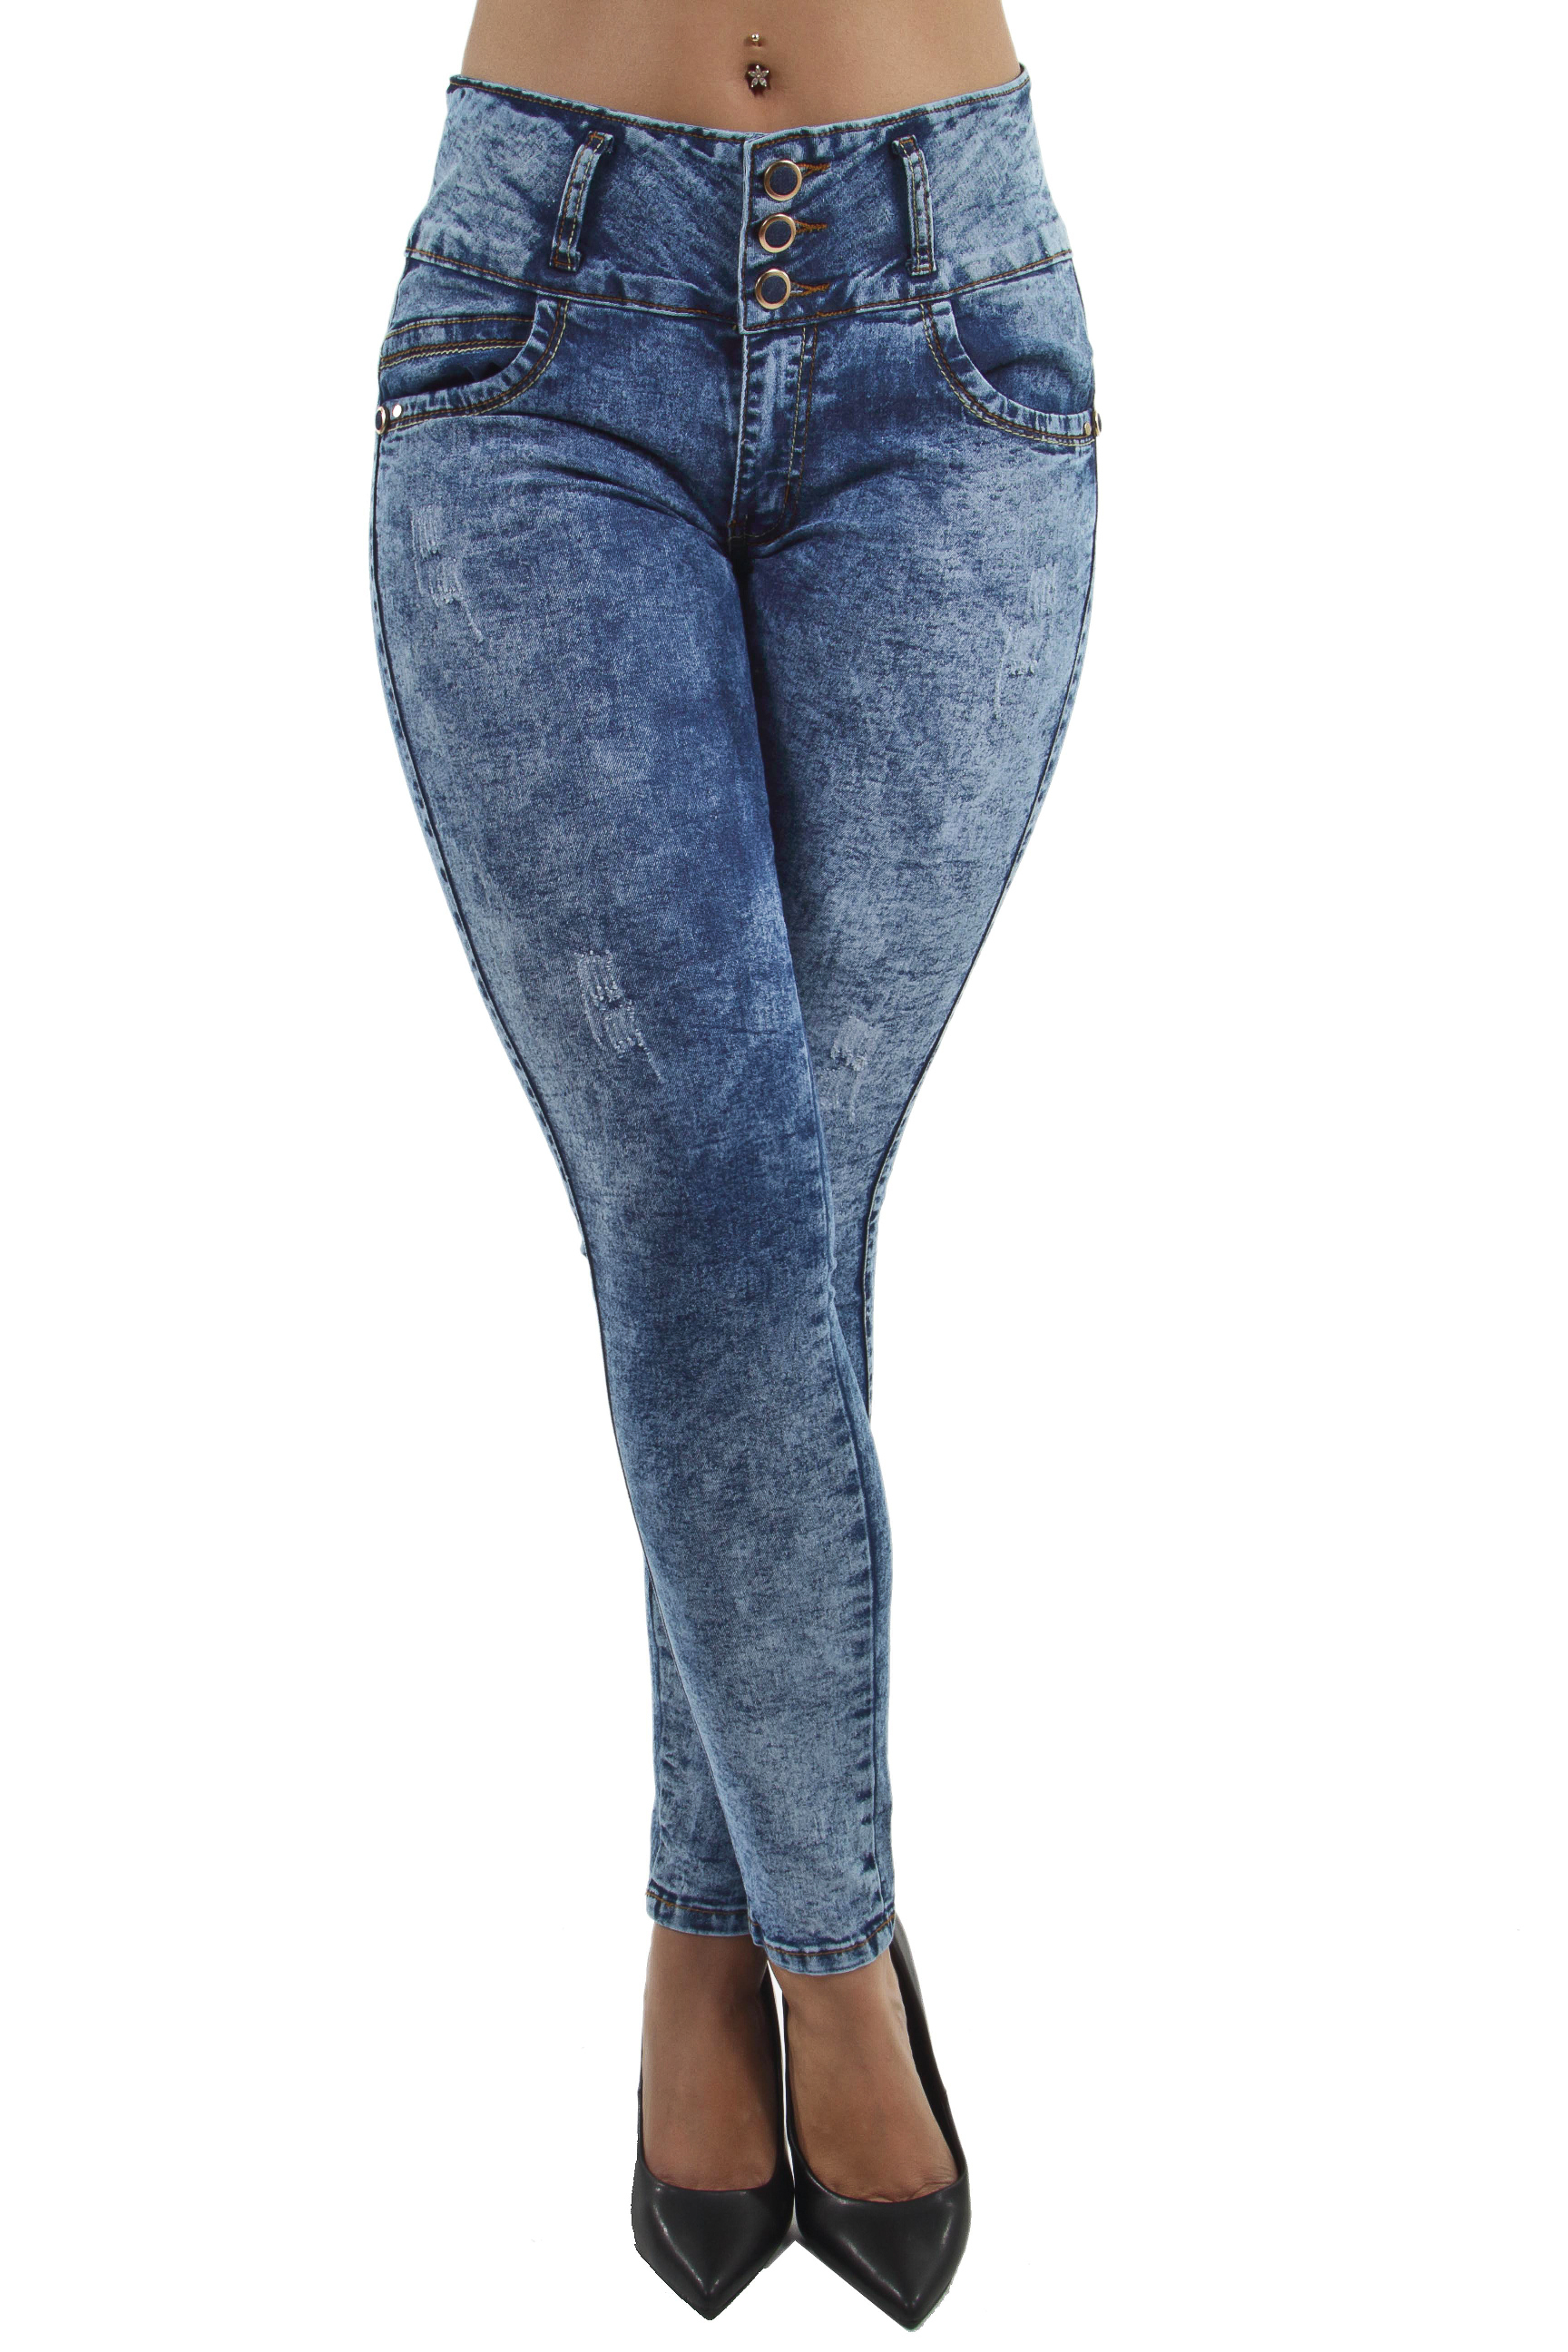 Women's Juniors Colombian Design Push Up Mid Waist Butt Lift Skinny Jeans